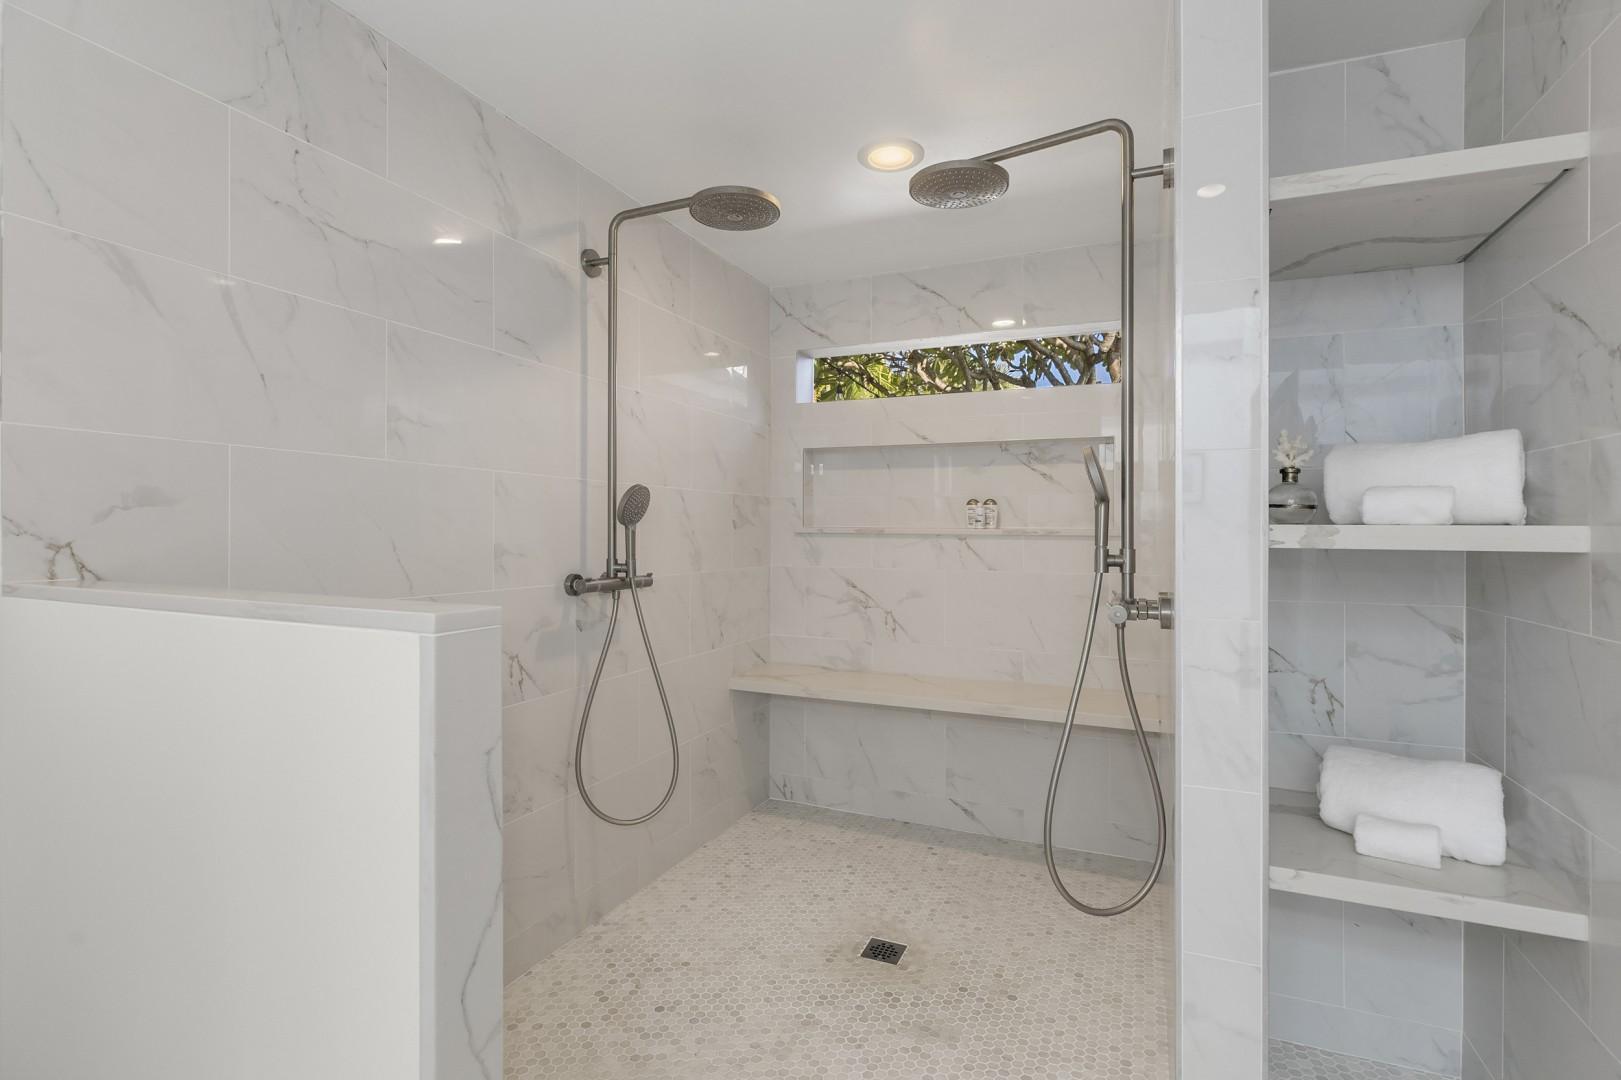 Master Ensuit e with extra large shower